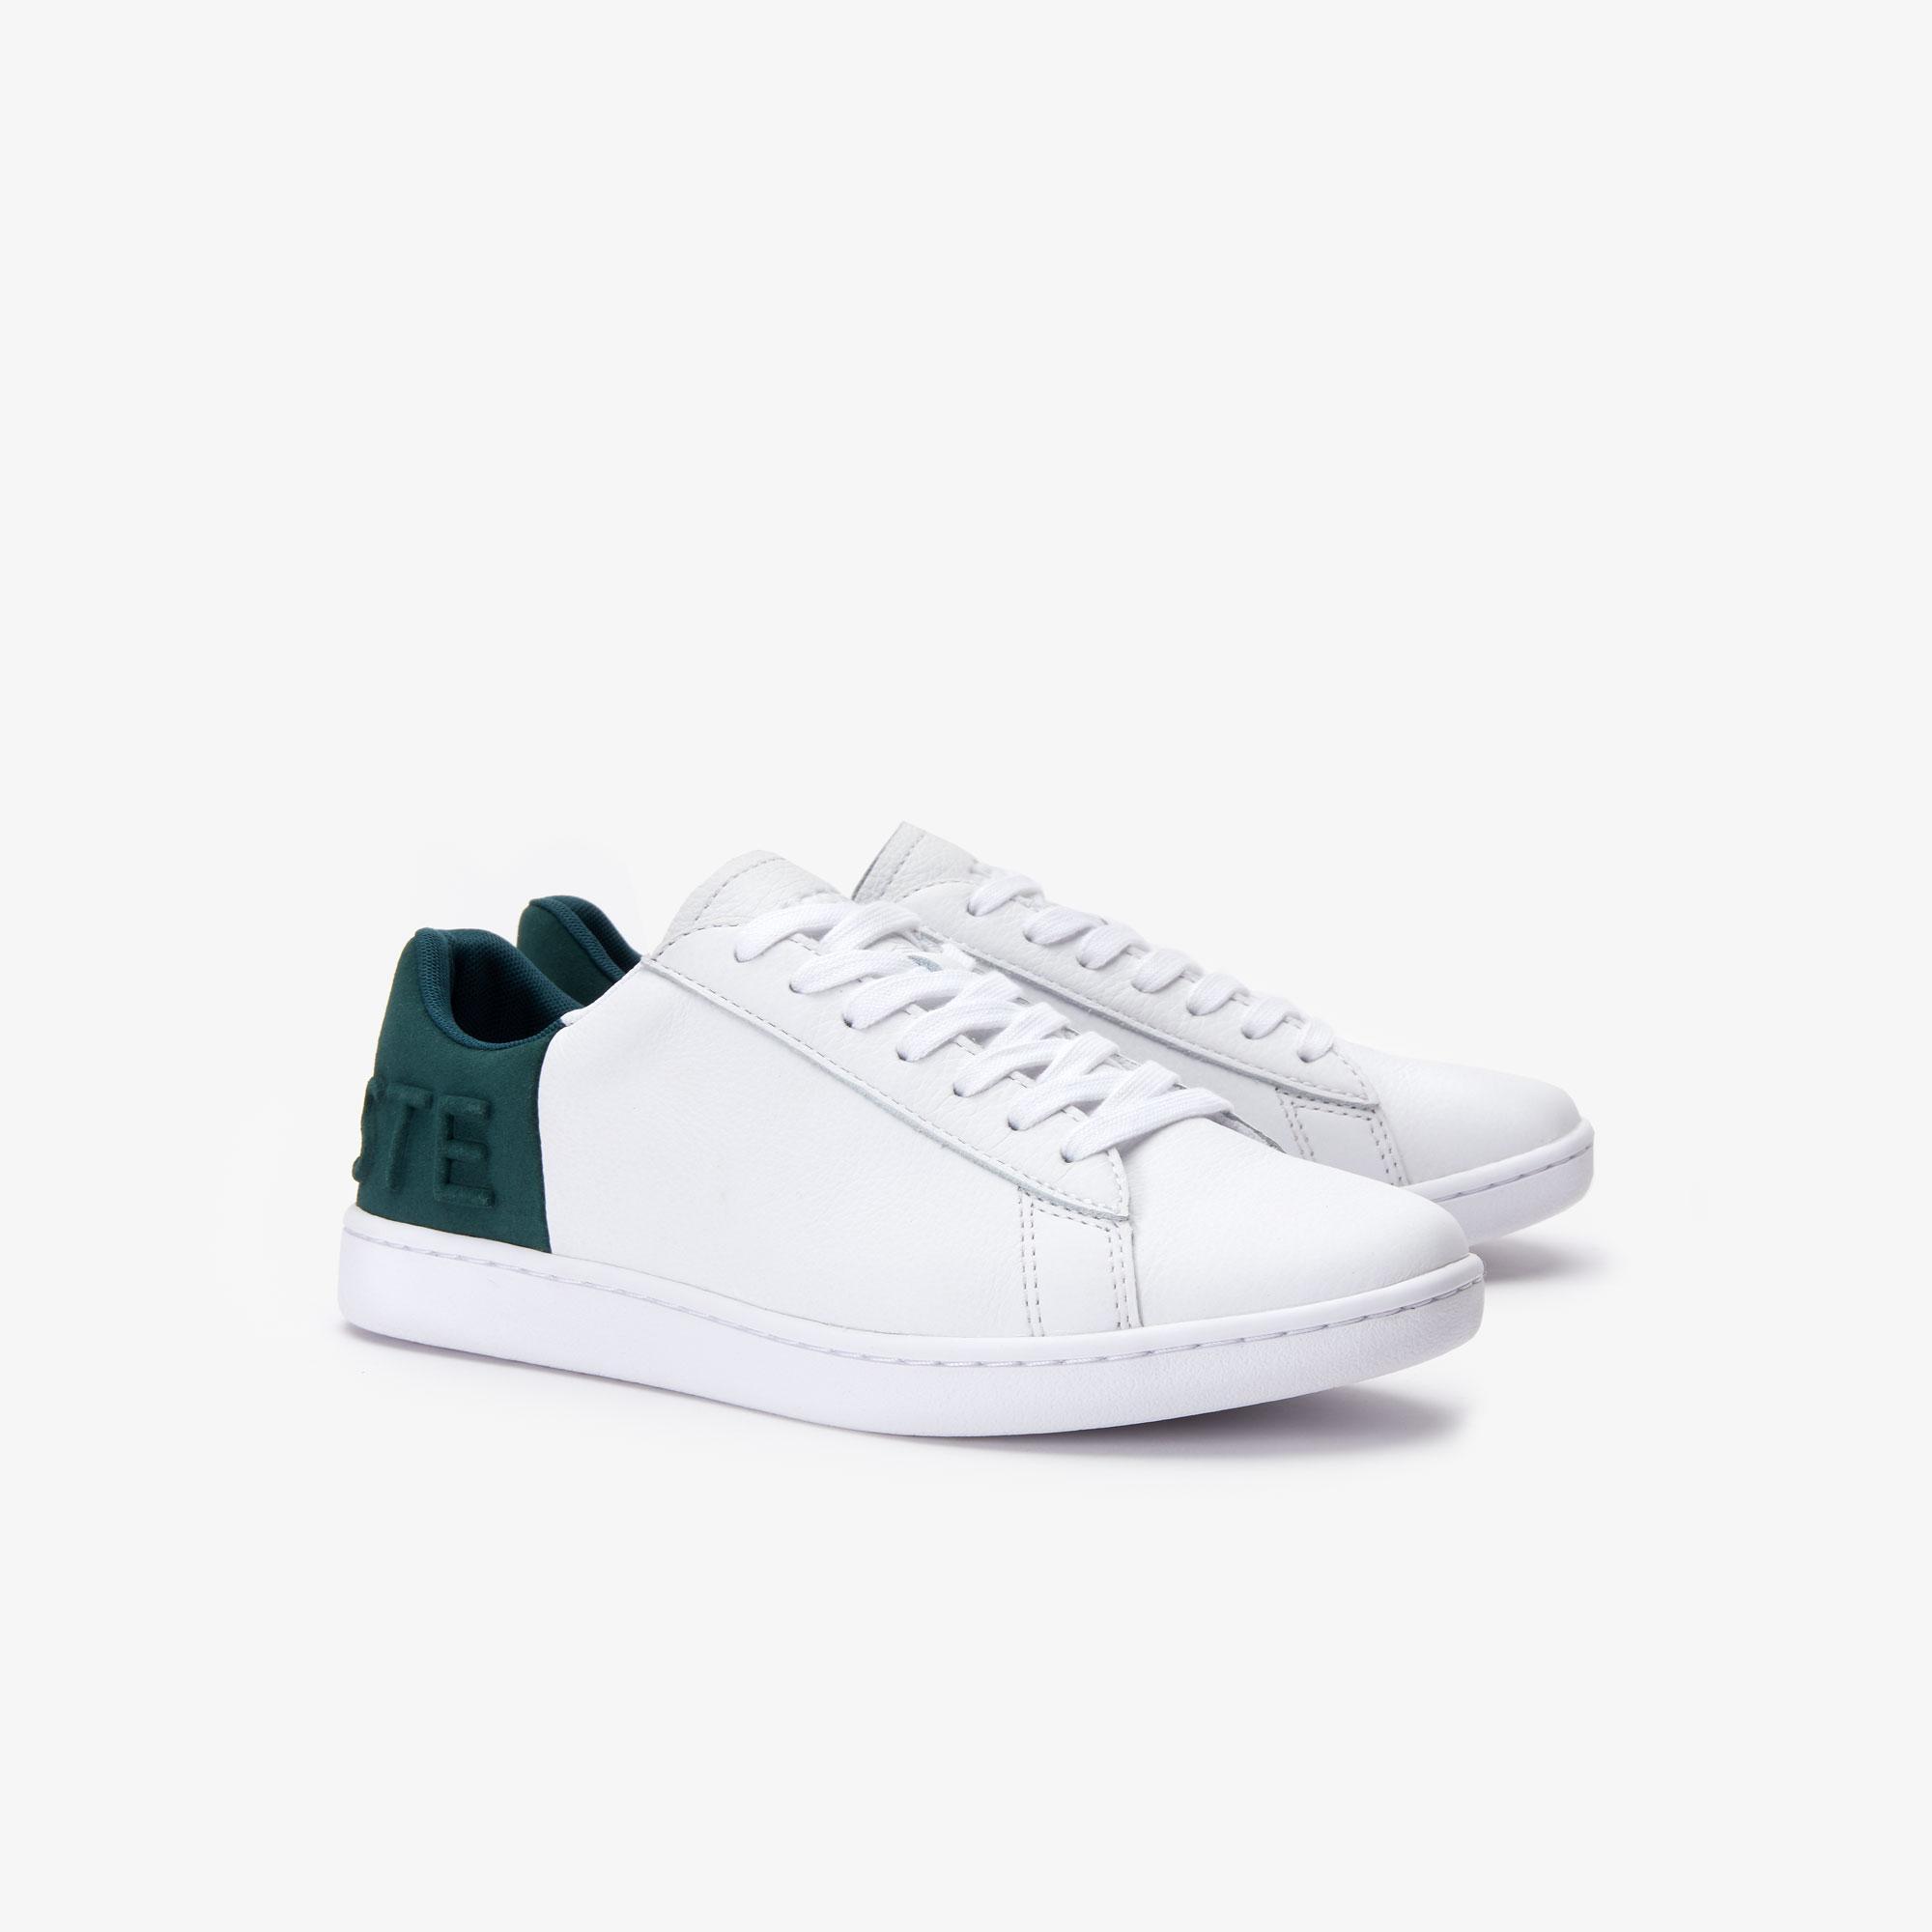 Lacoste Carnaby Evo 419 2 Damskie Sneakersy